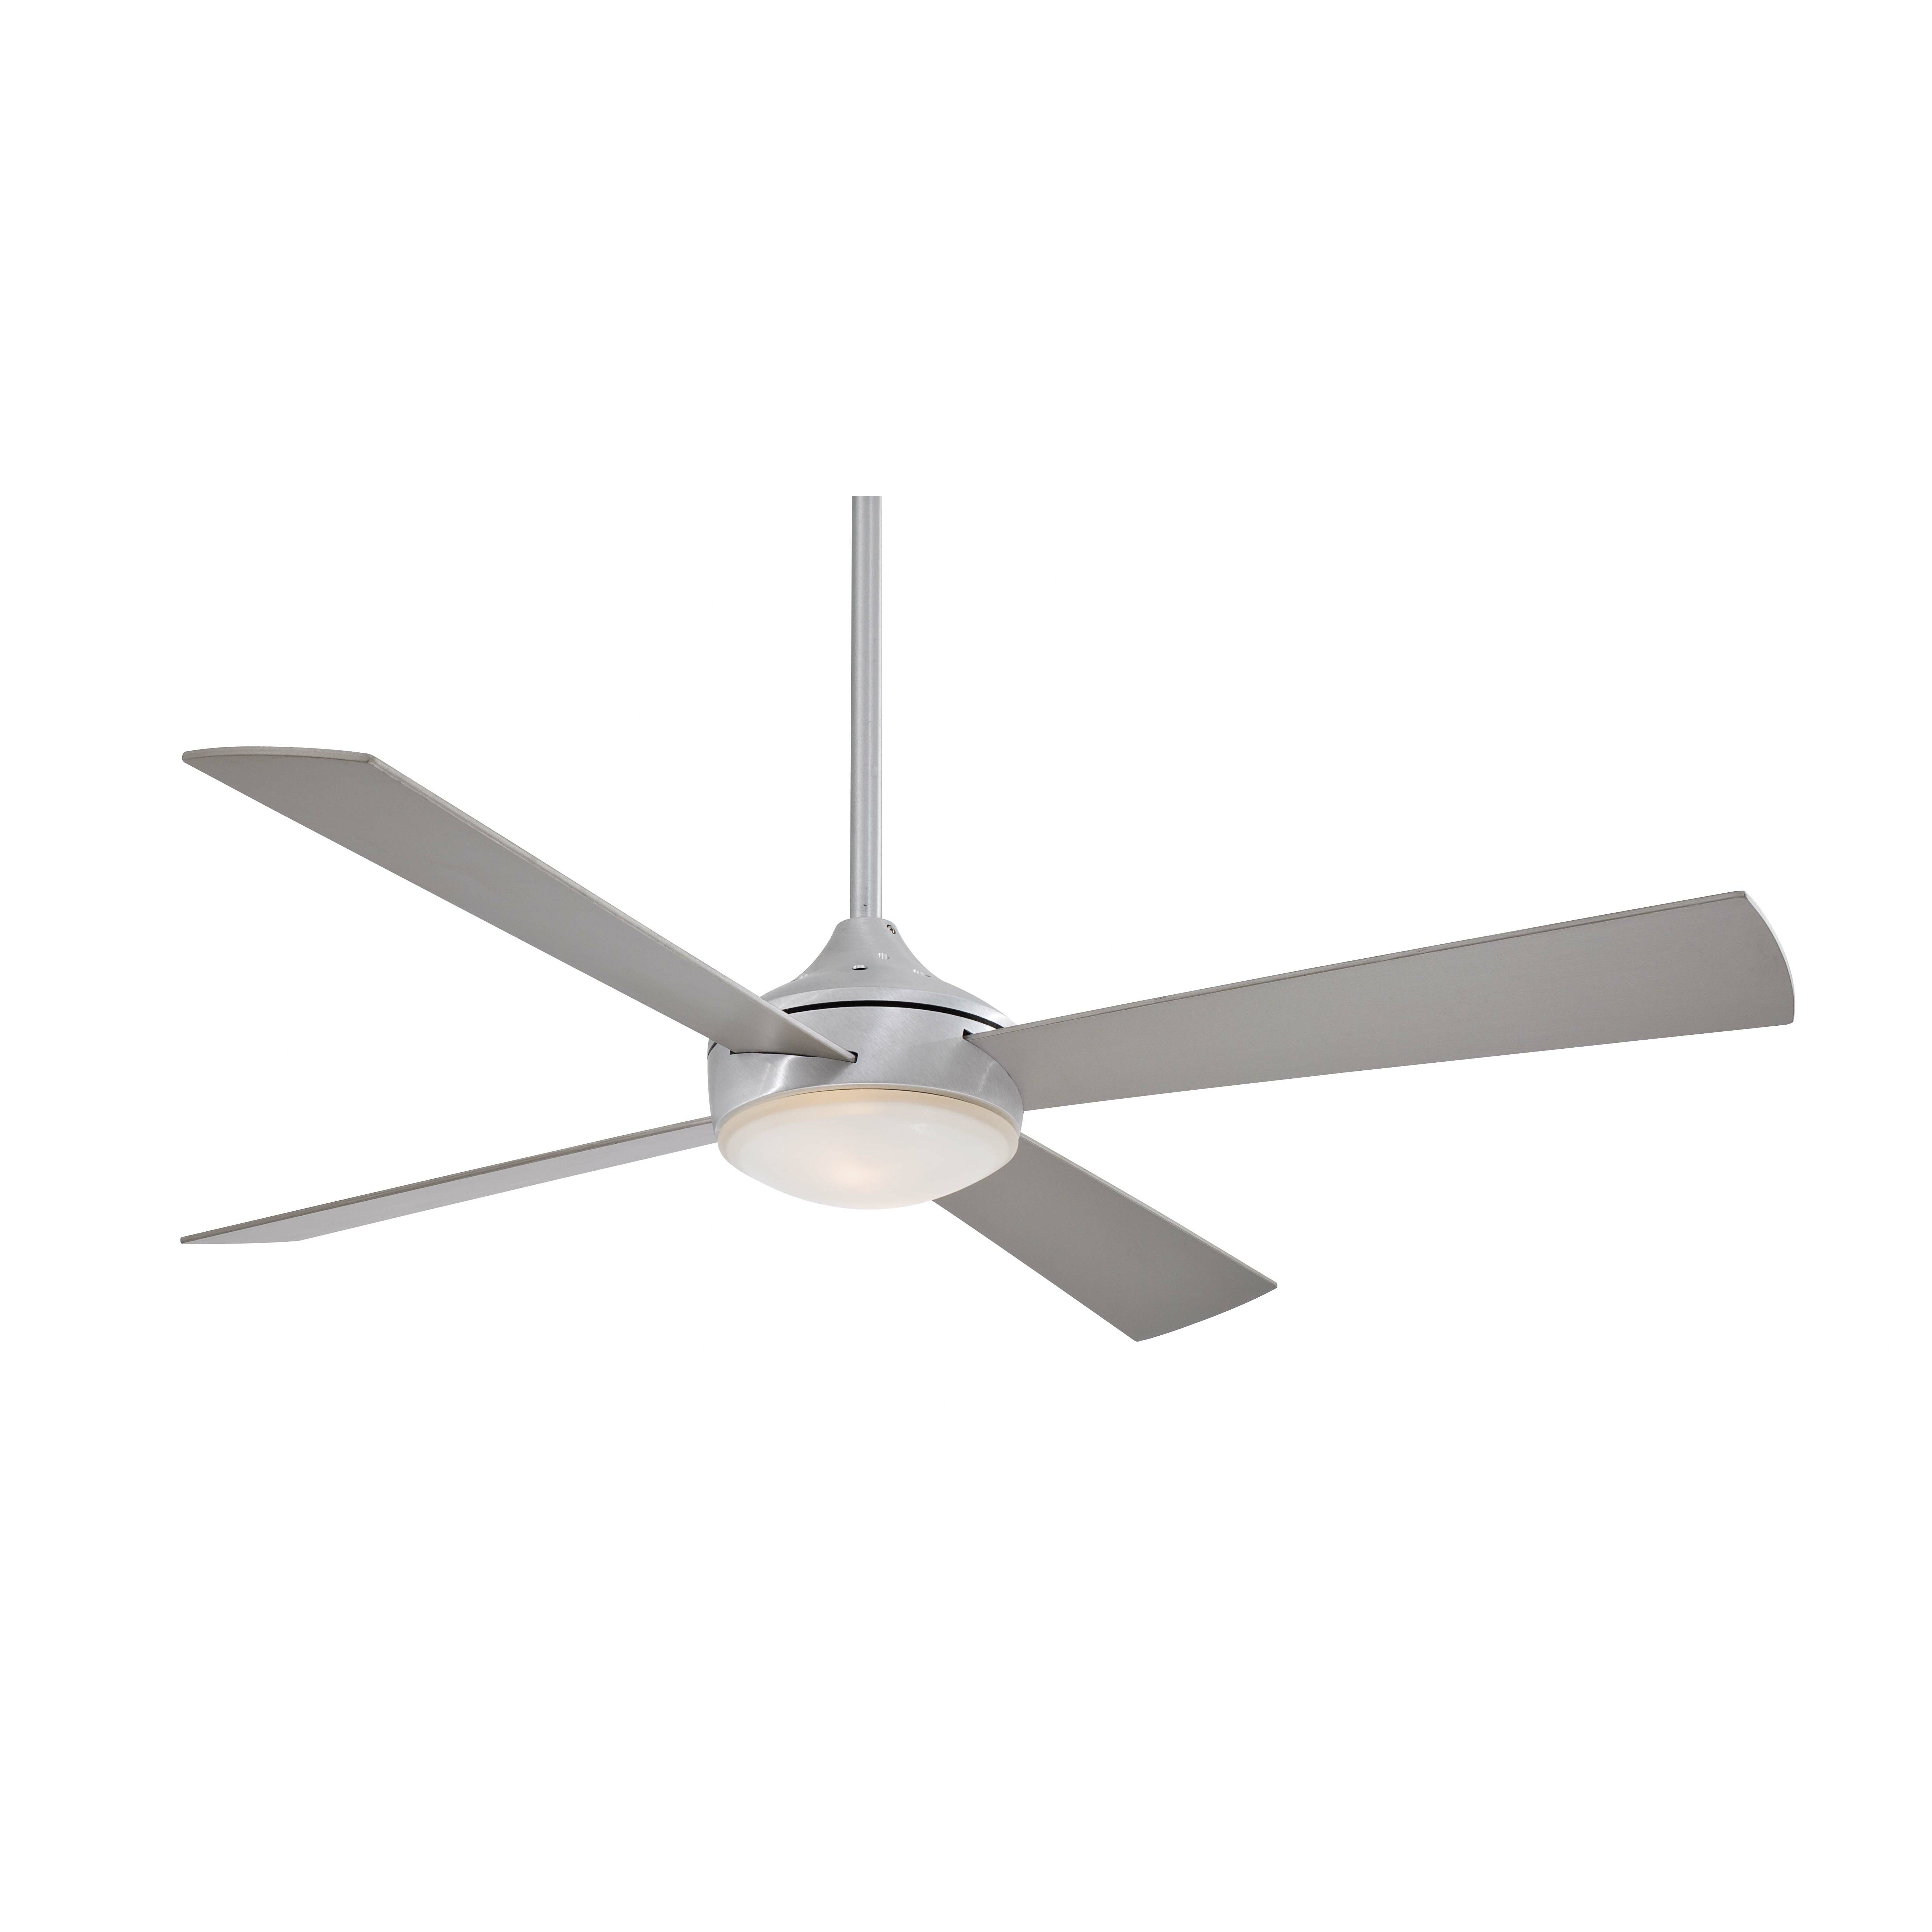 Four Blade Fan : Minka aire quot aluma blade ceiling fan reviews wayfair